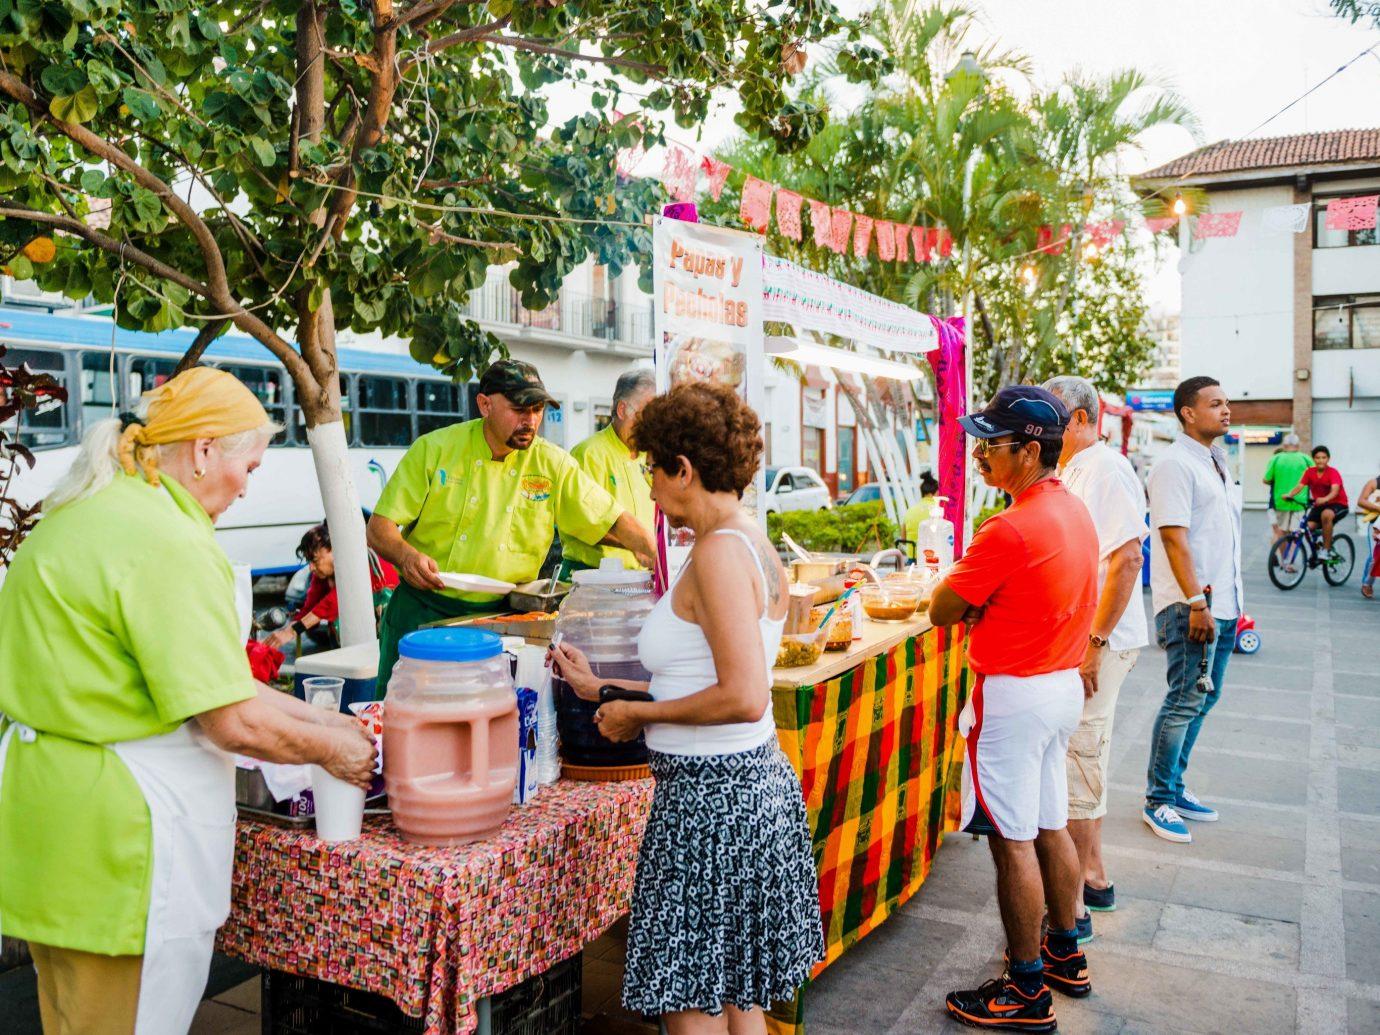 Food + Drink Mexico Puerto Vallarta street recreation marketplace market leisure tourism food City